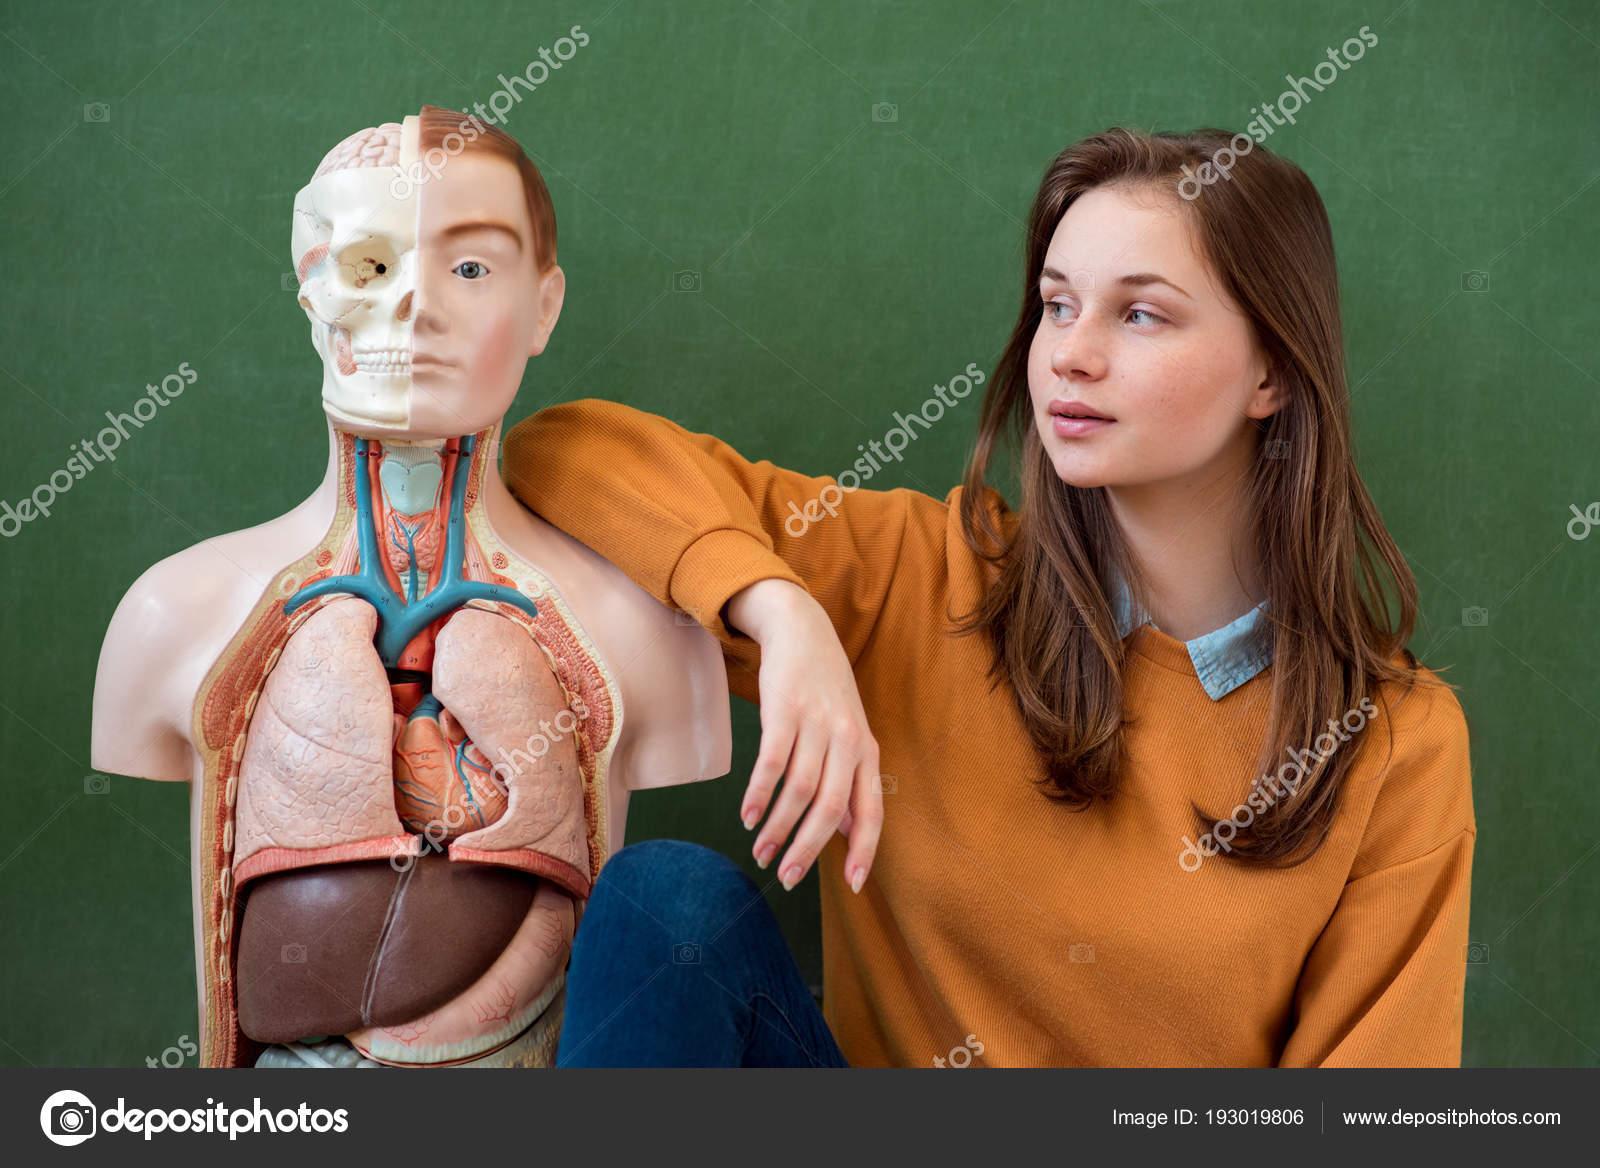 Cool Female High School Student Portrait Artificial Human Body Model